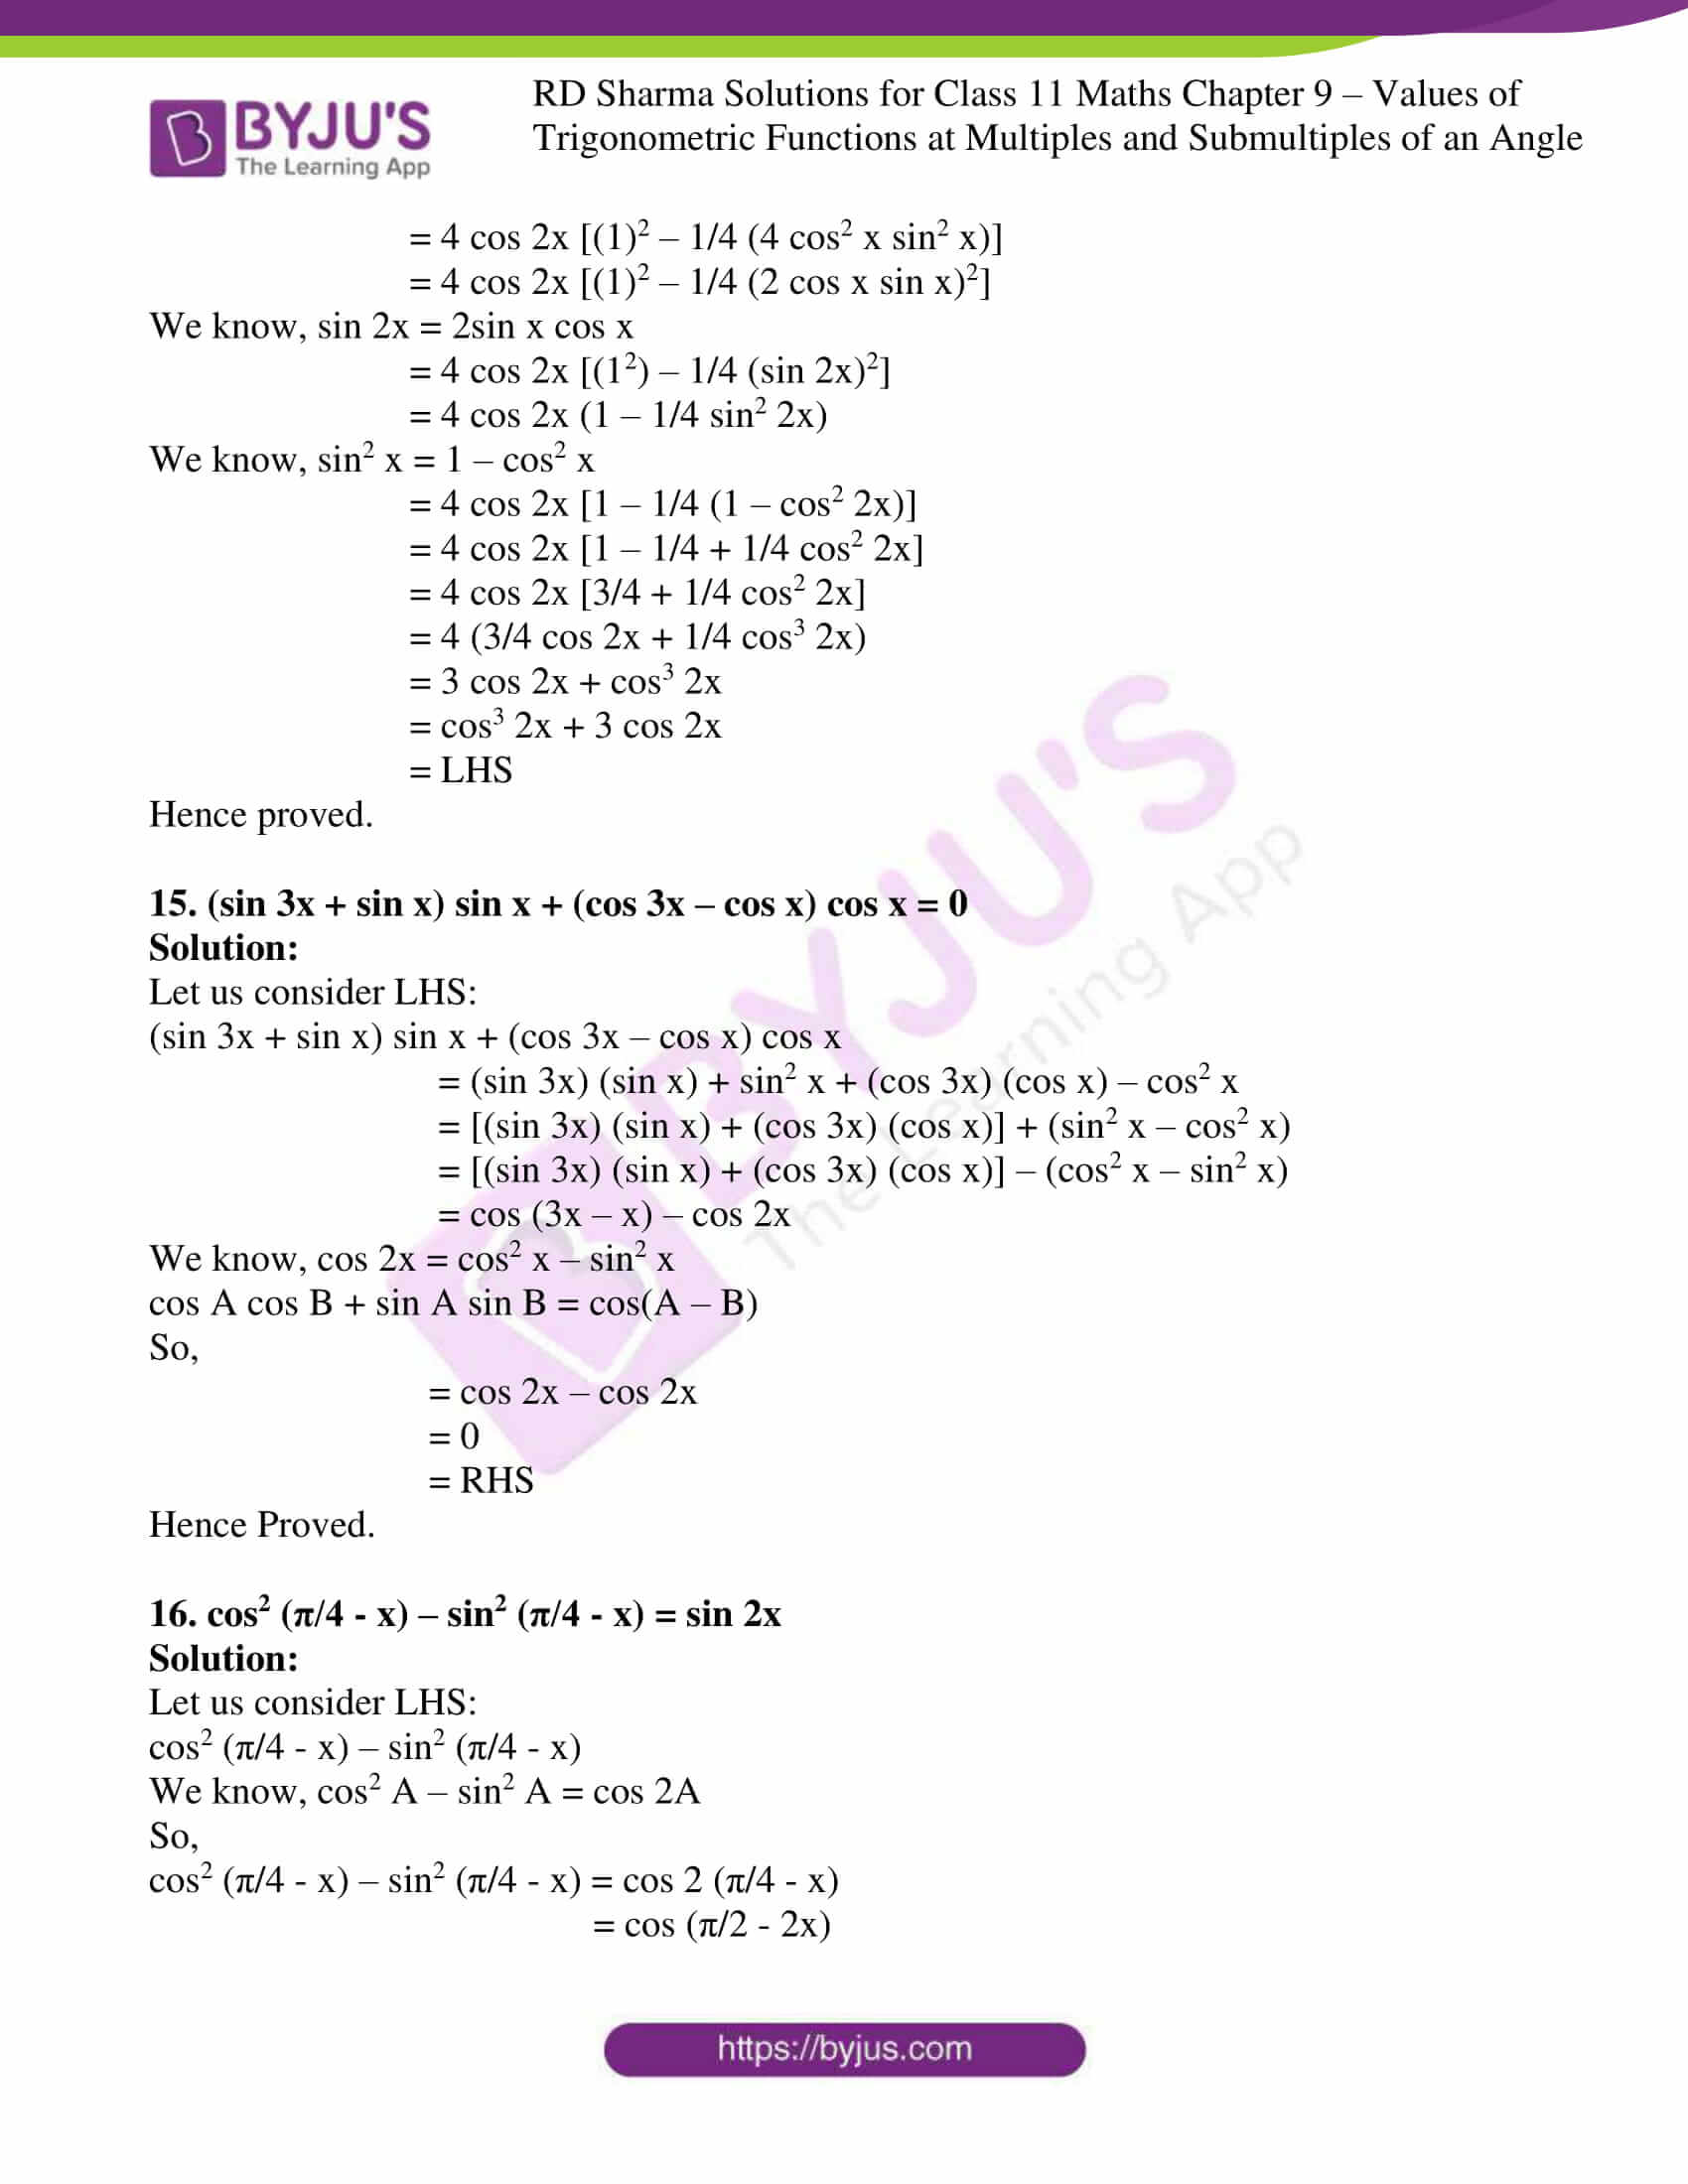 rd sharma class 11 maths ch 9 ex 1 10